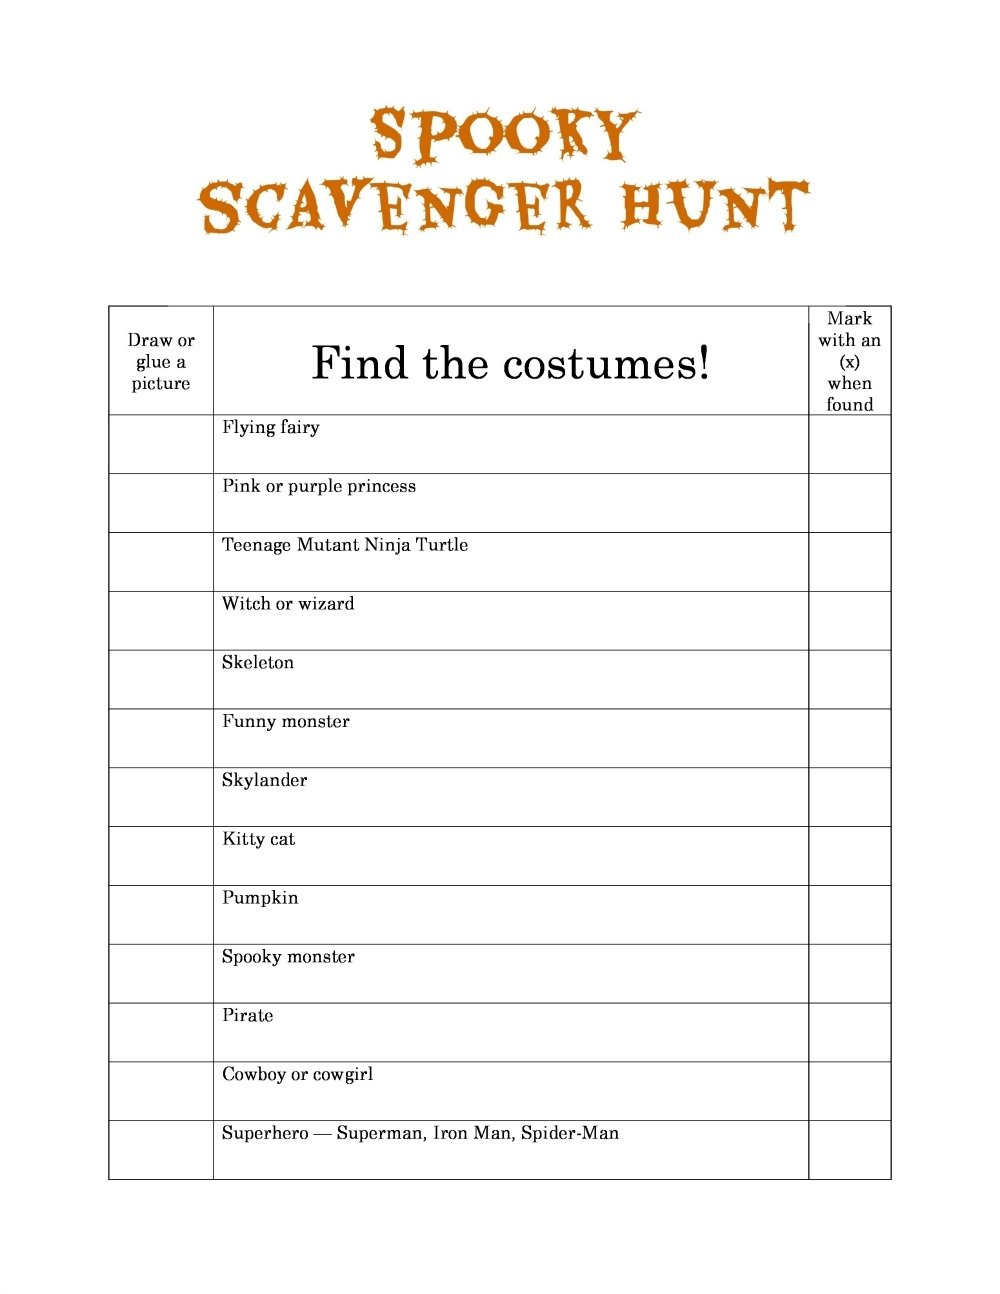 10 Elegant Around Town Scavenger Hunt Ideas spooky scavenger hunts 1 2020